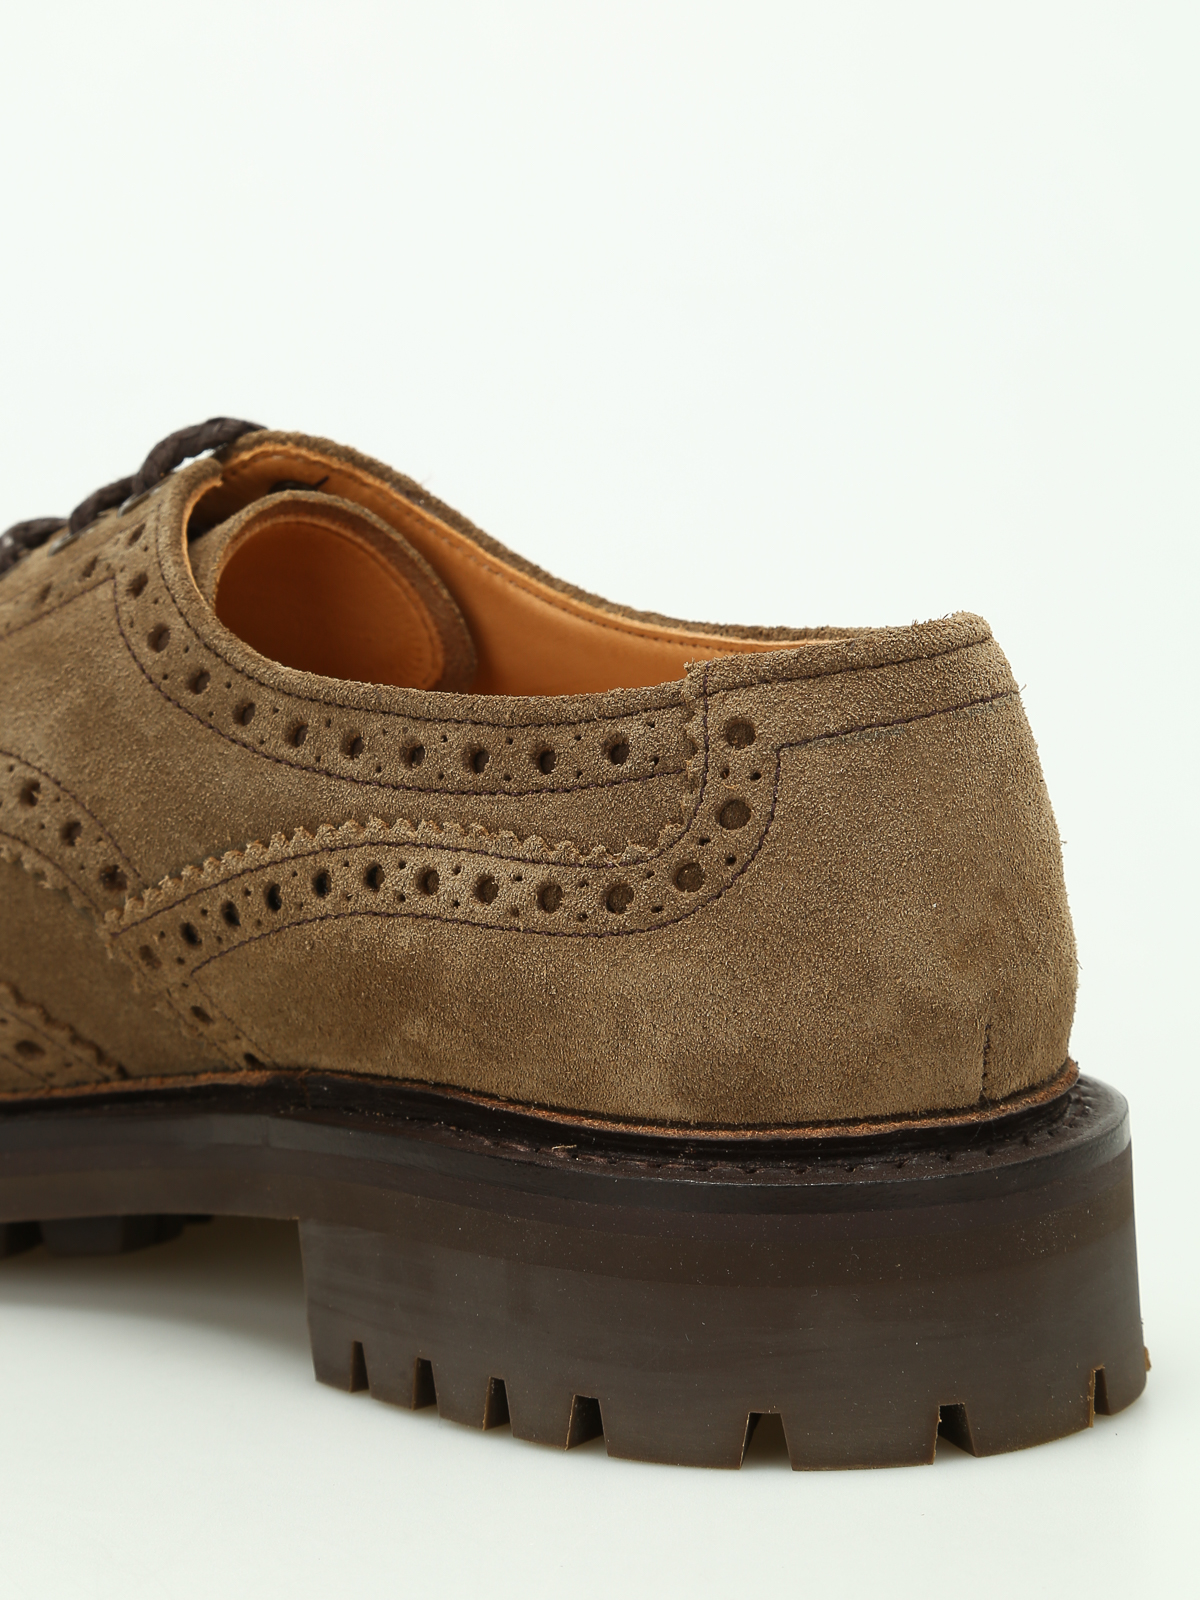 84ca437087eb Classiques Plowden Homme Pour Chaussures Church s nvxwqSA